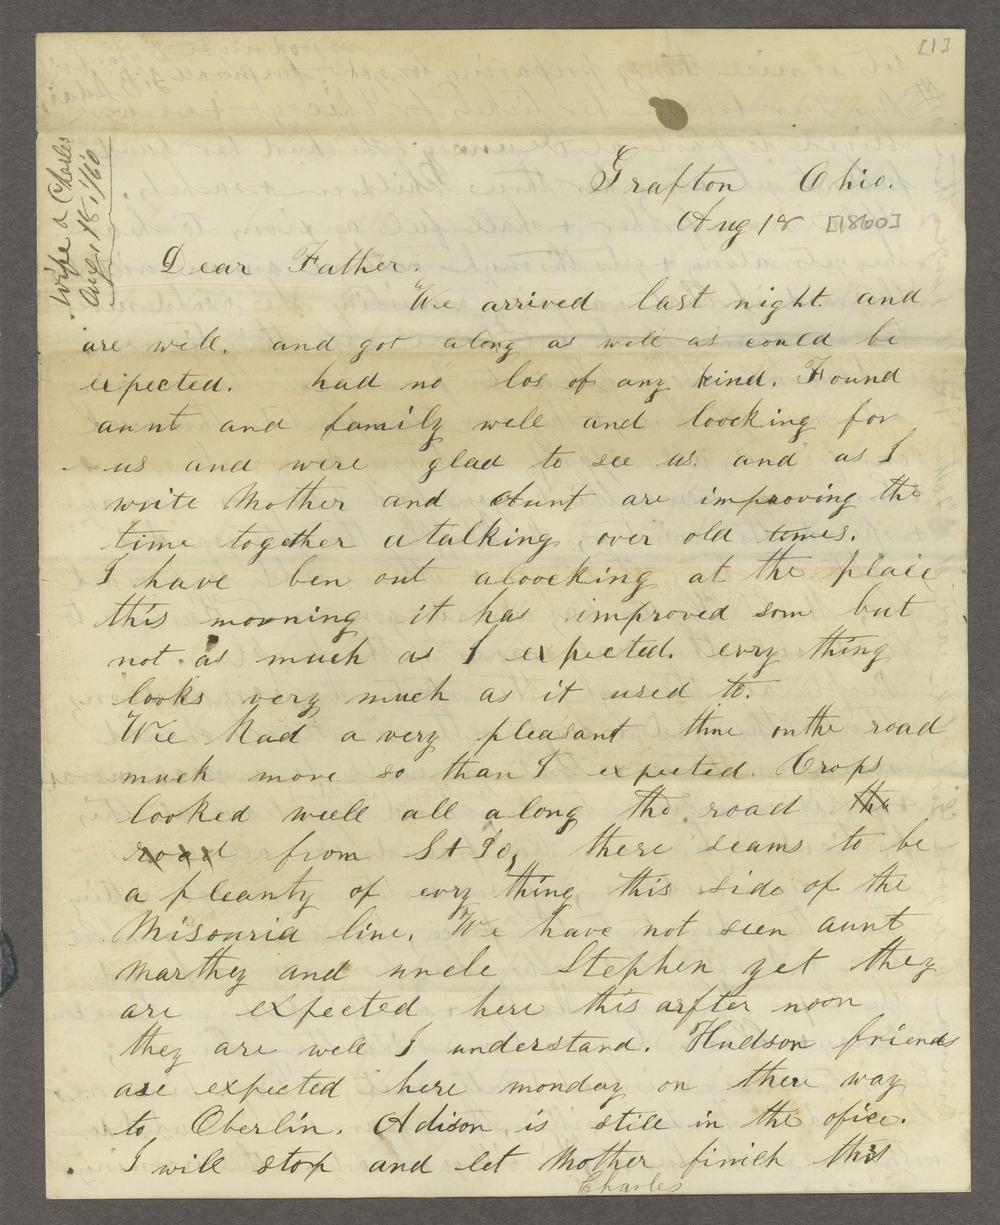 Correspondence between Samuel Lyle Adair, Florella Brown Adair, and their children - 1